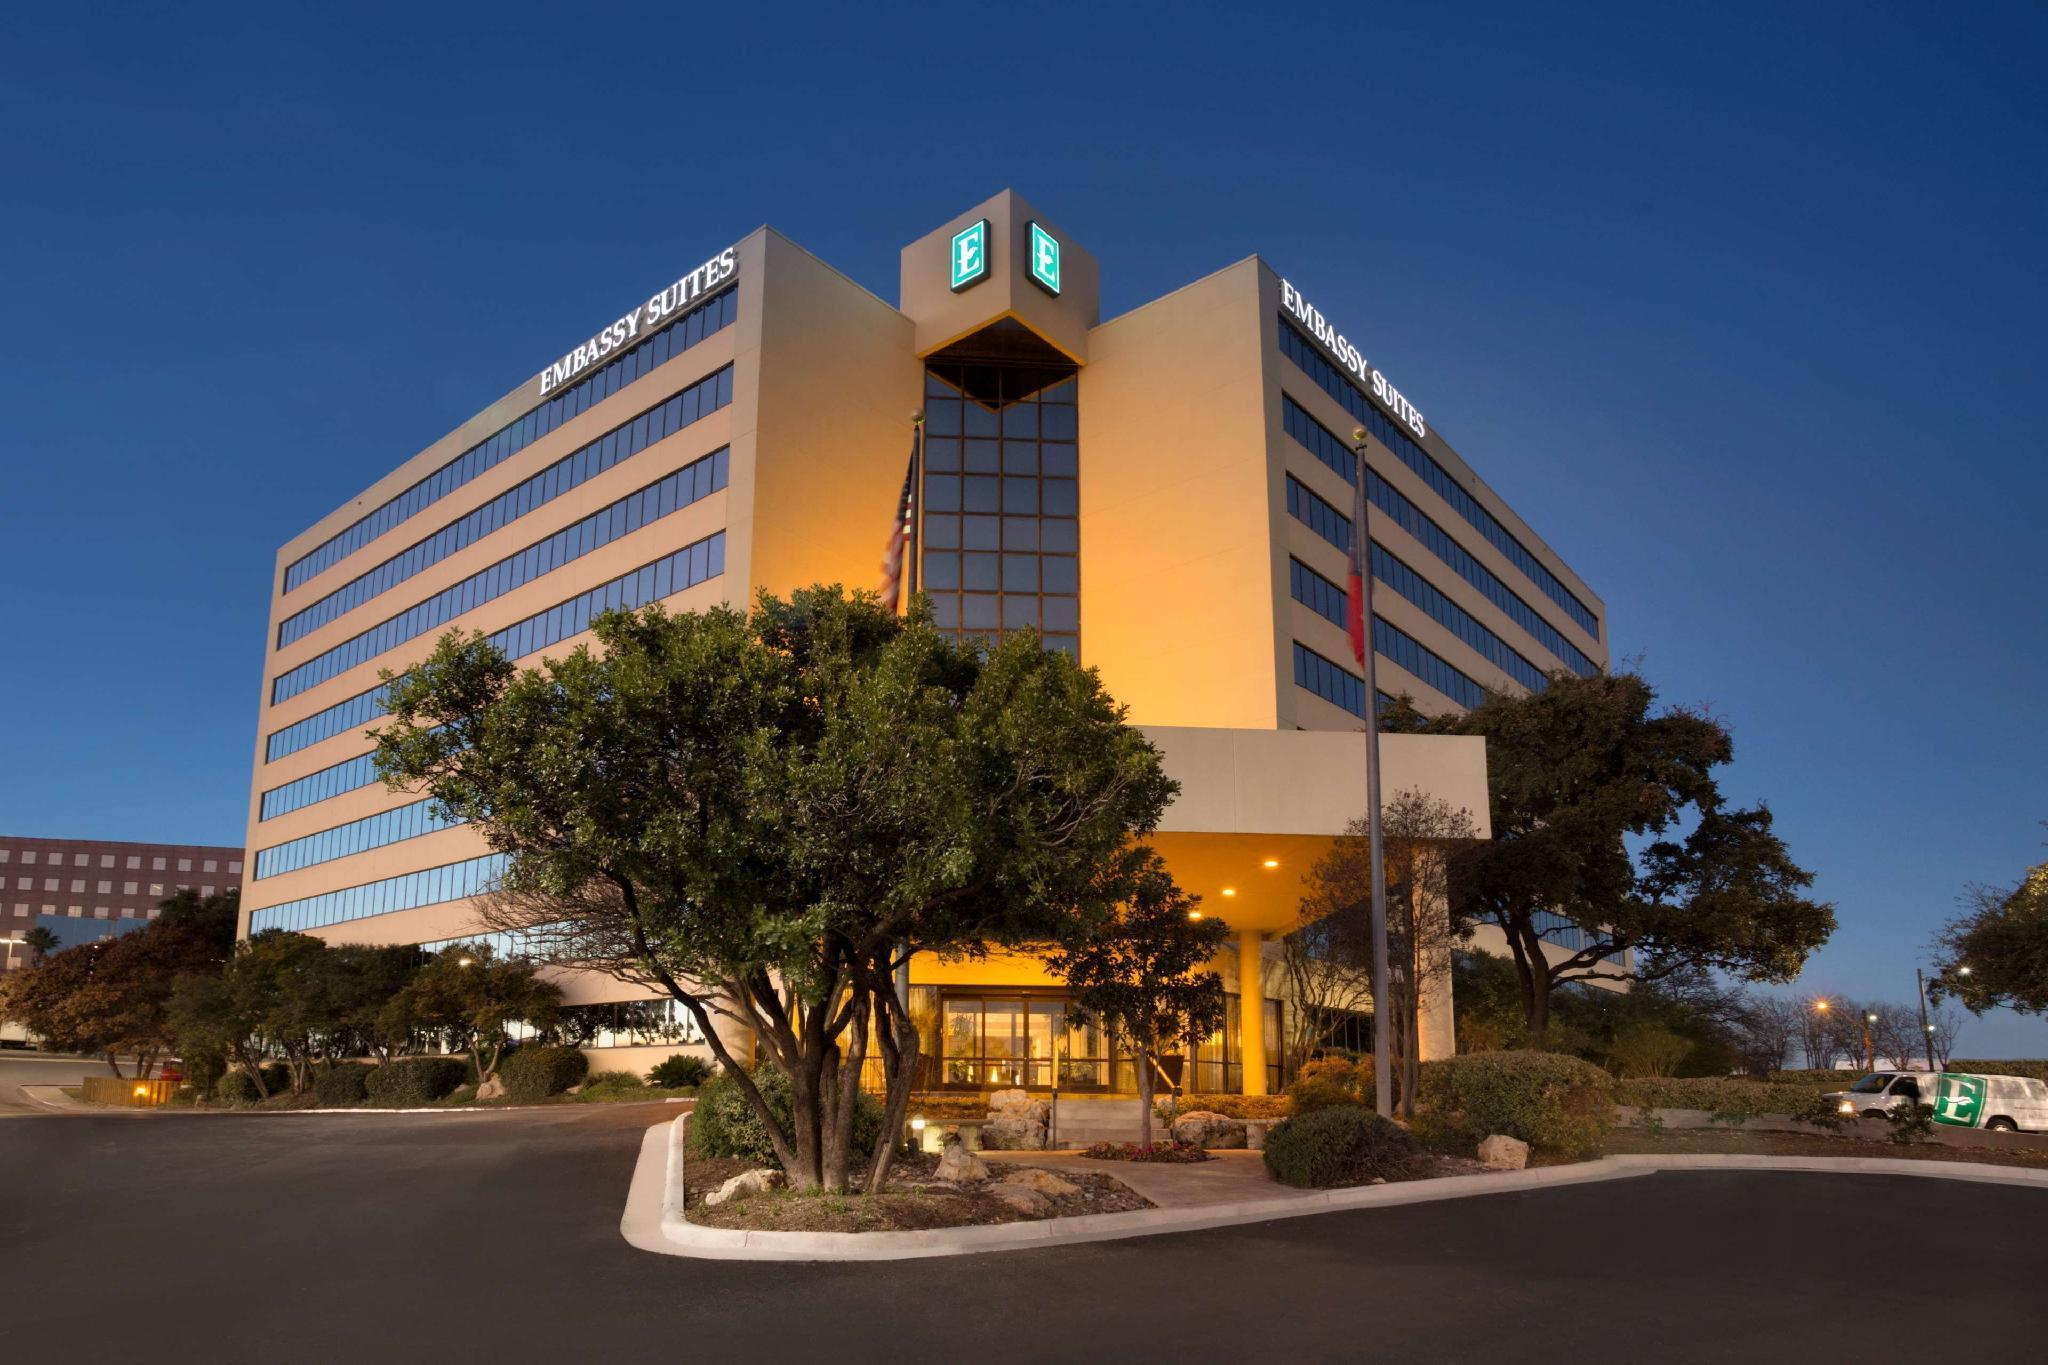 Embassy Suites San Antonio International Airport Hotel